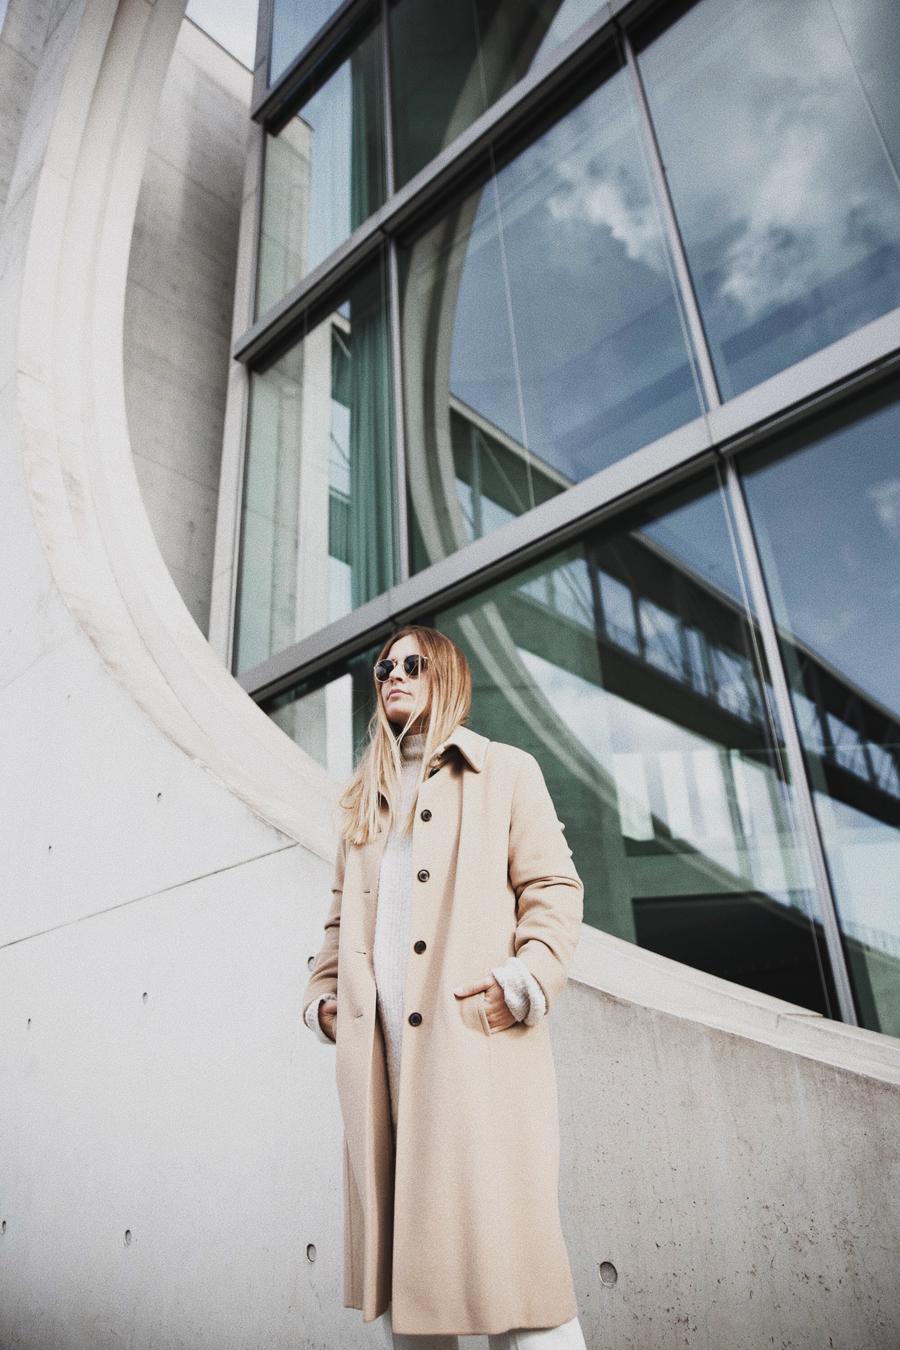 streetstyle-fashionblogger-camel-coat-romina-mey-architecture-berlin